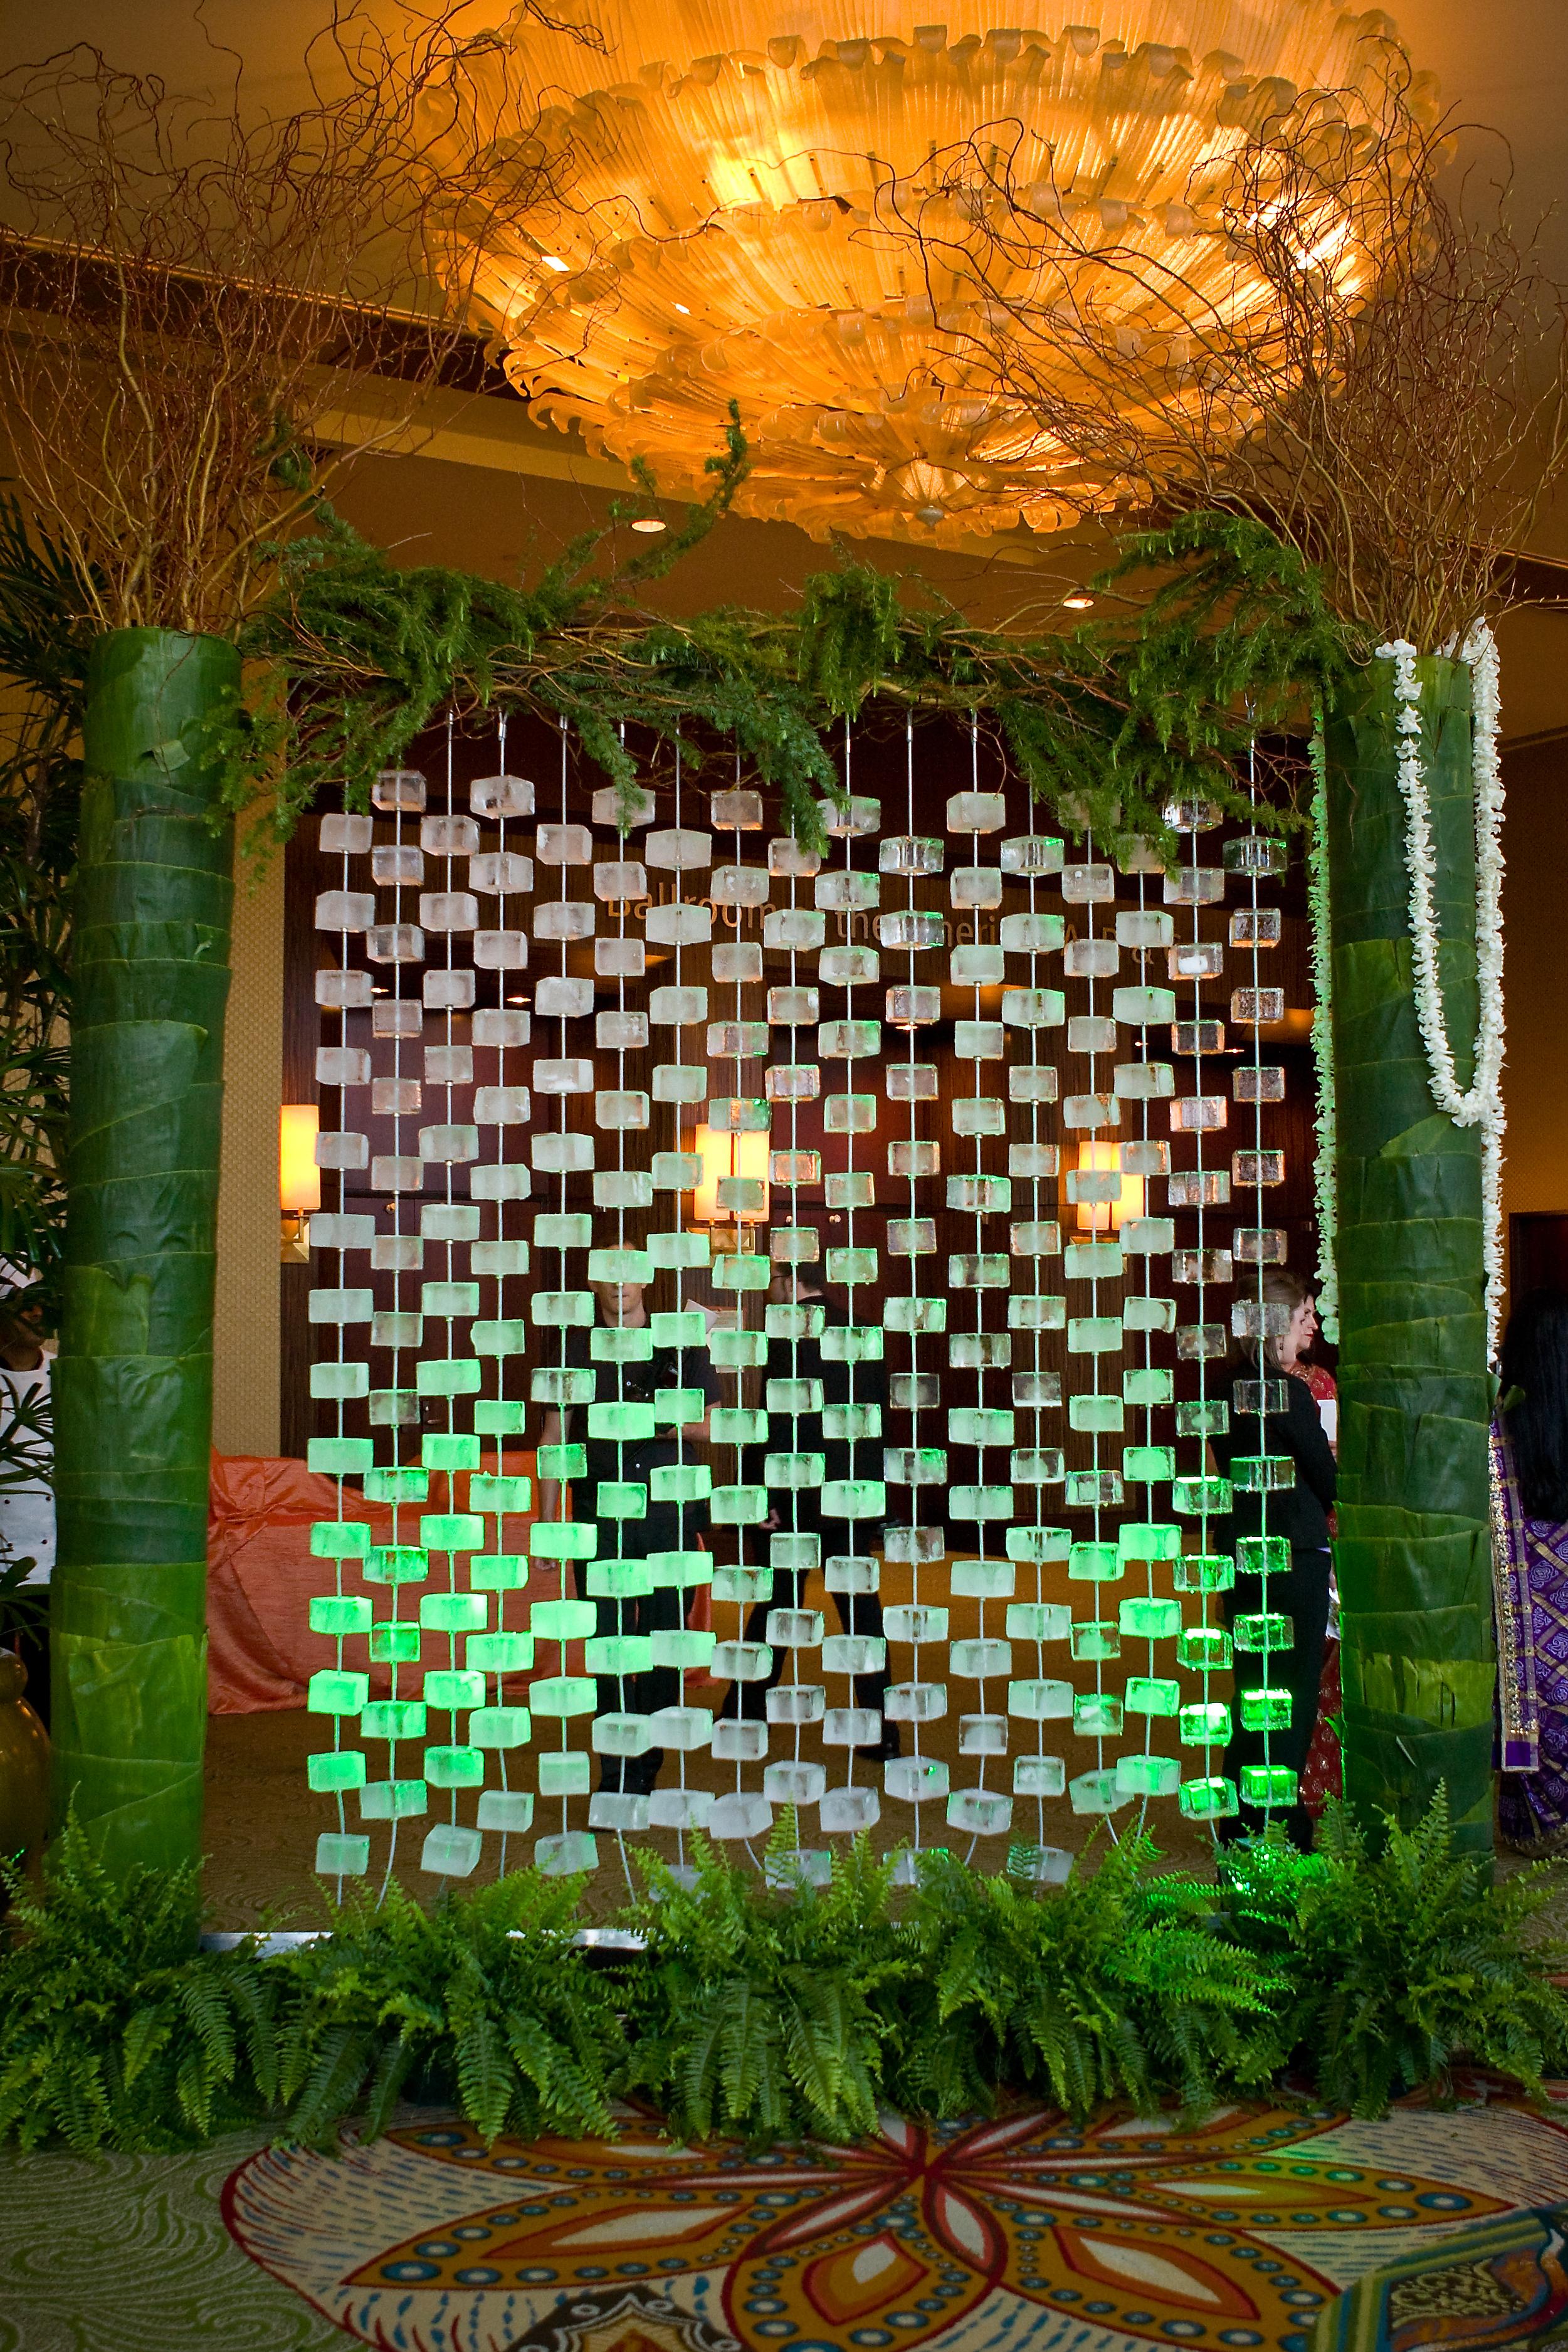 Hilton Americas #4